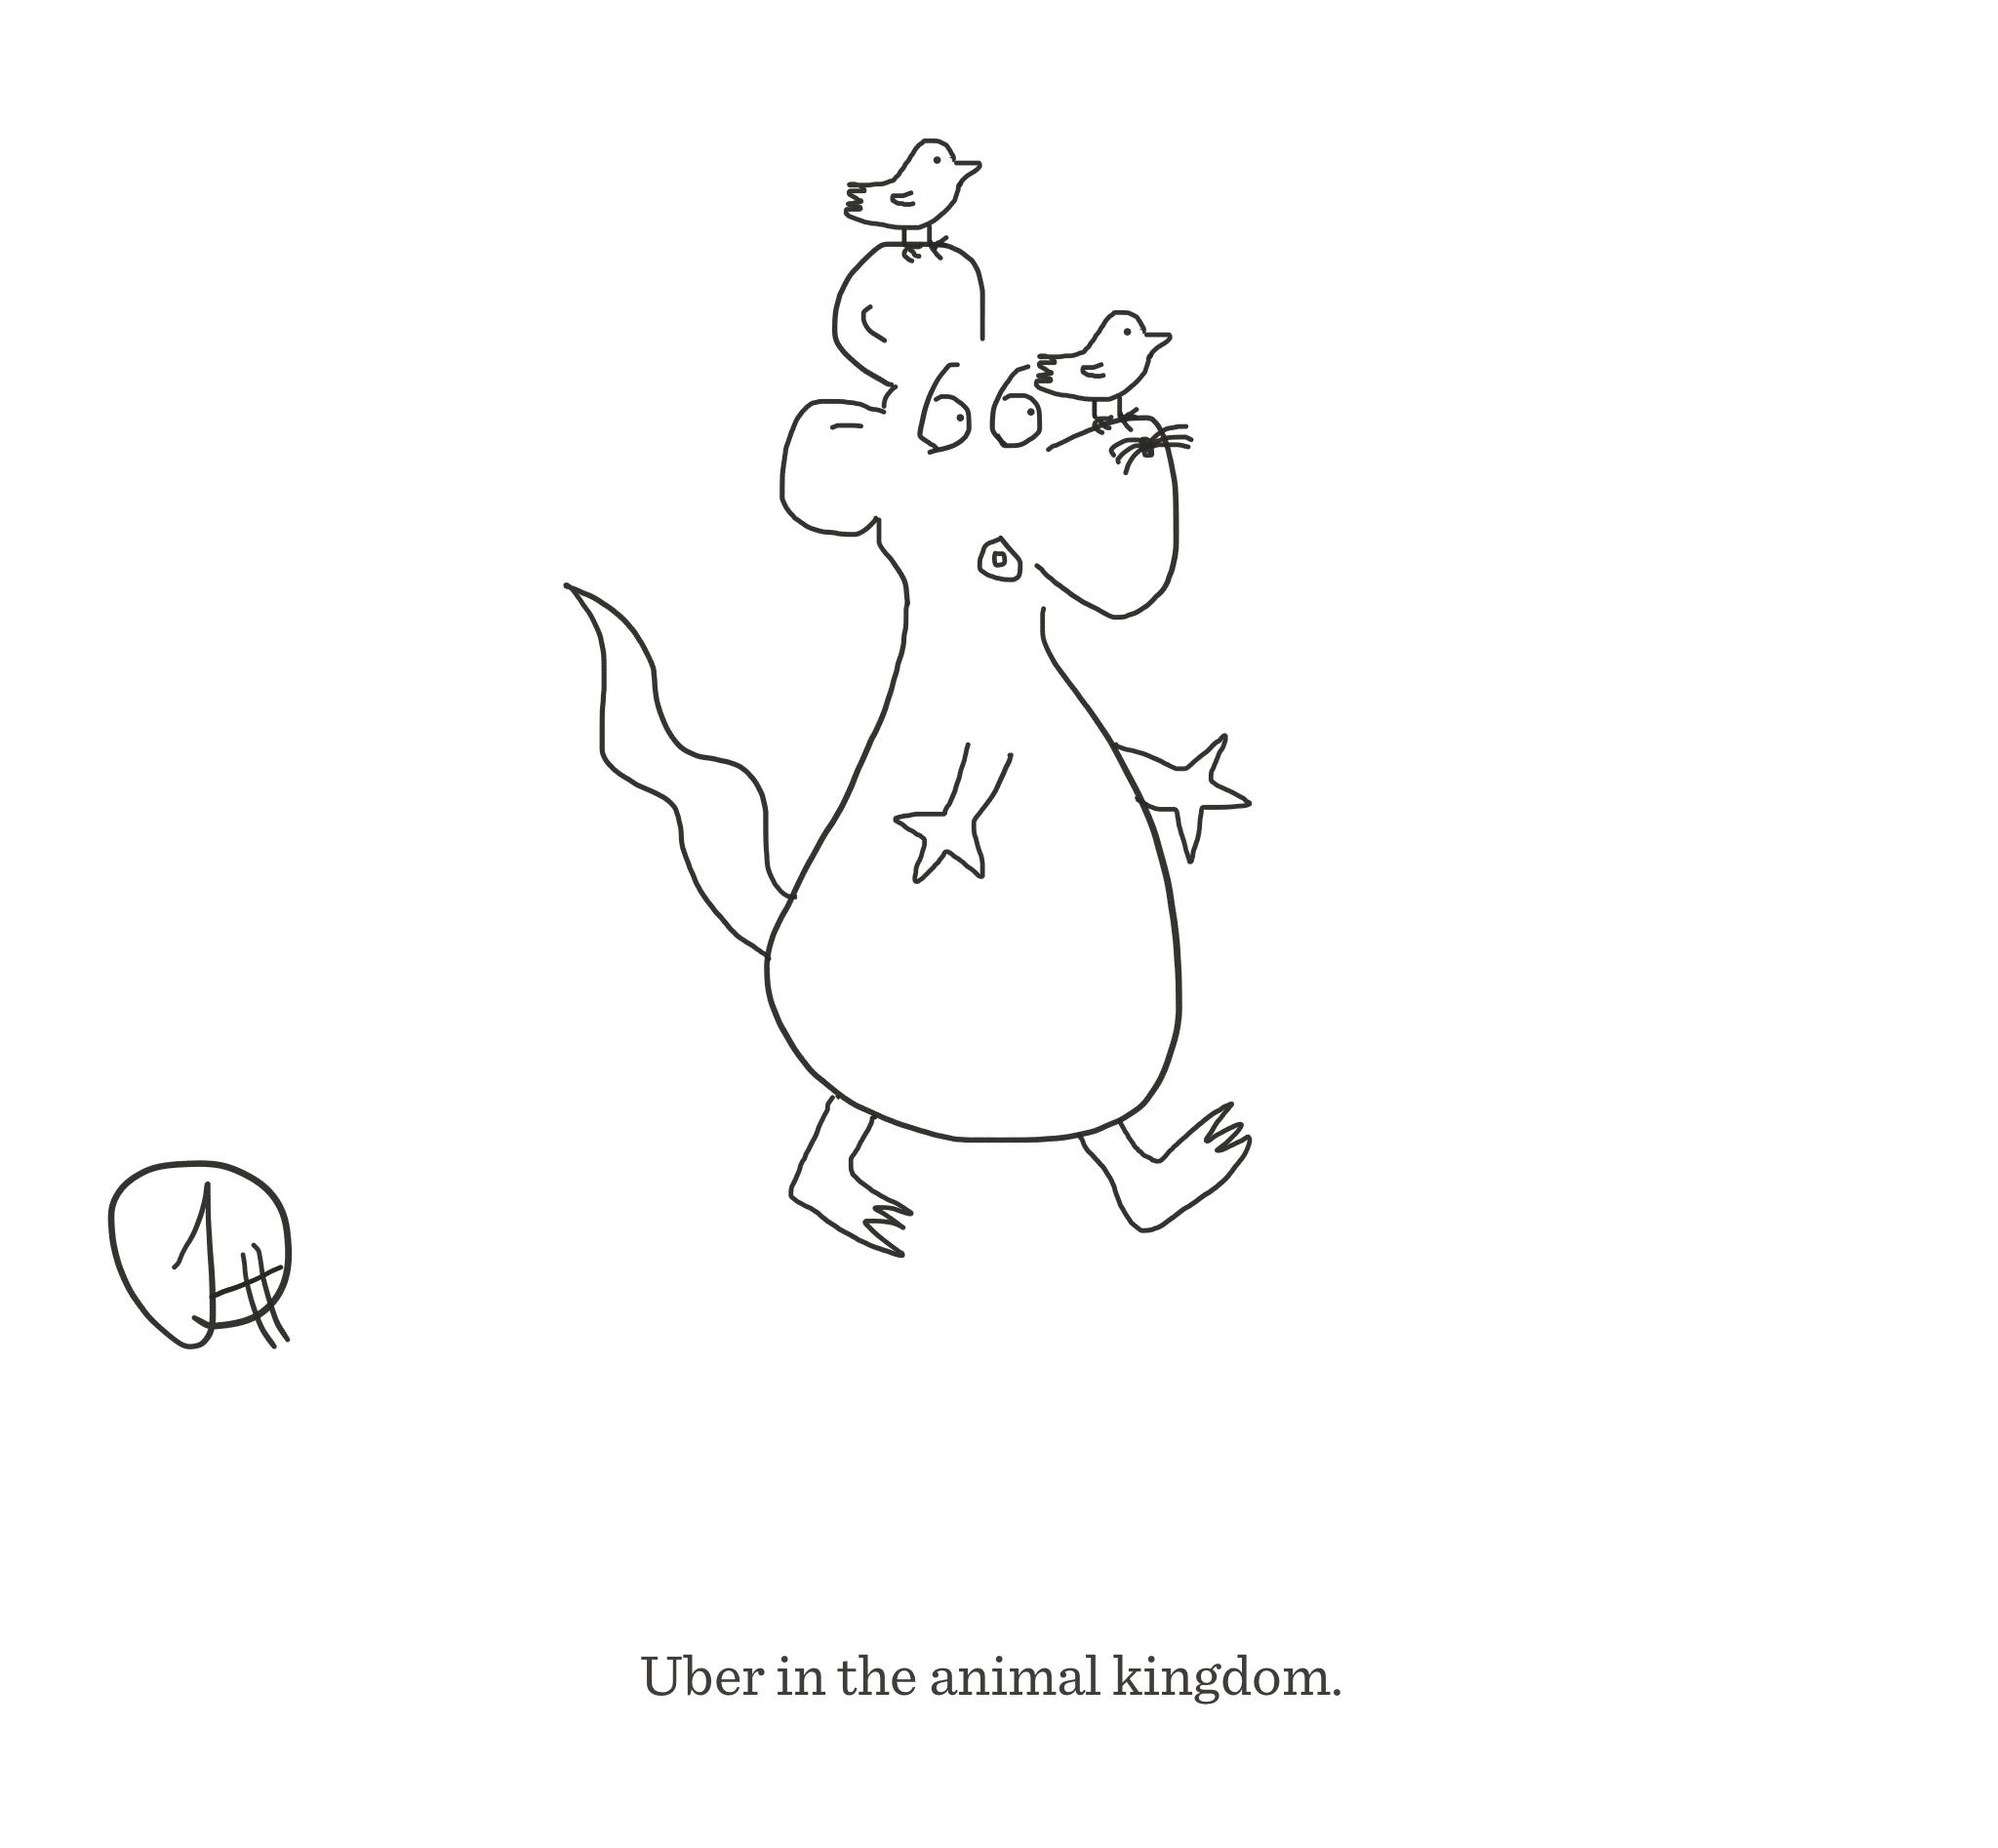 Uber in the animal kingdom, The Happy Rat cartoon